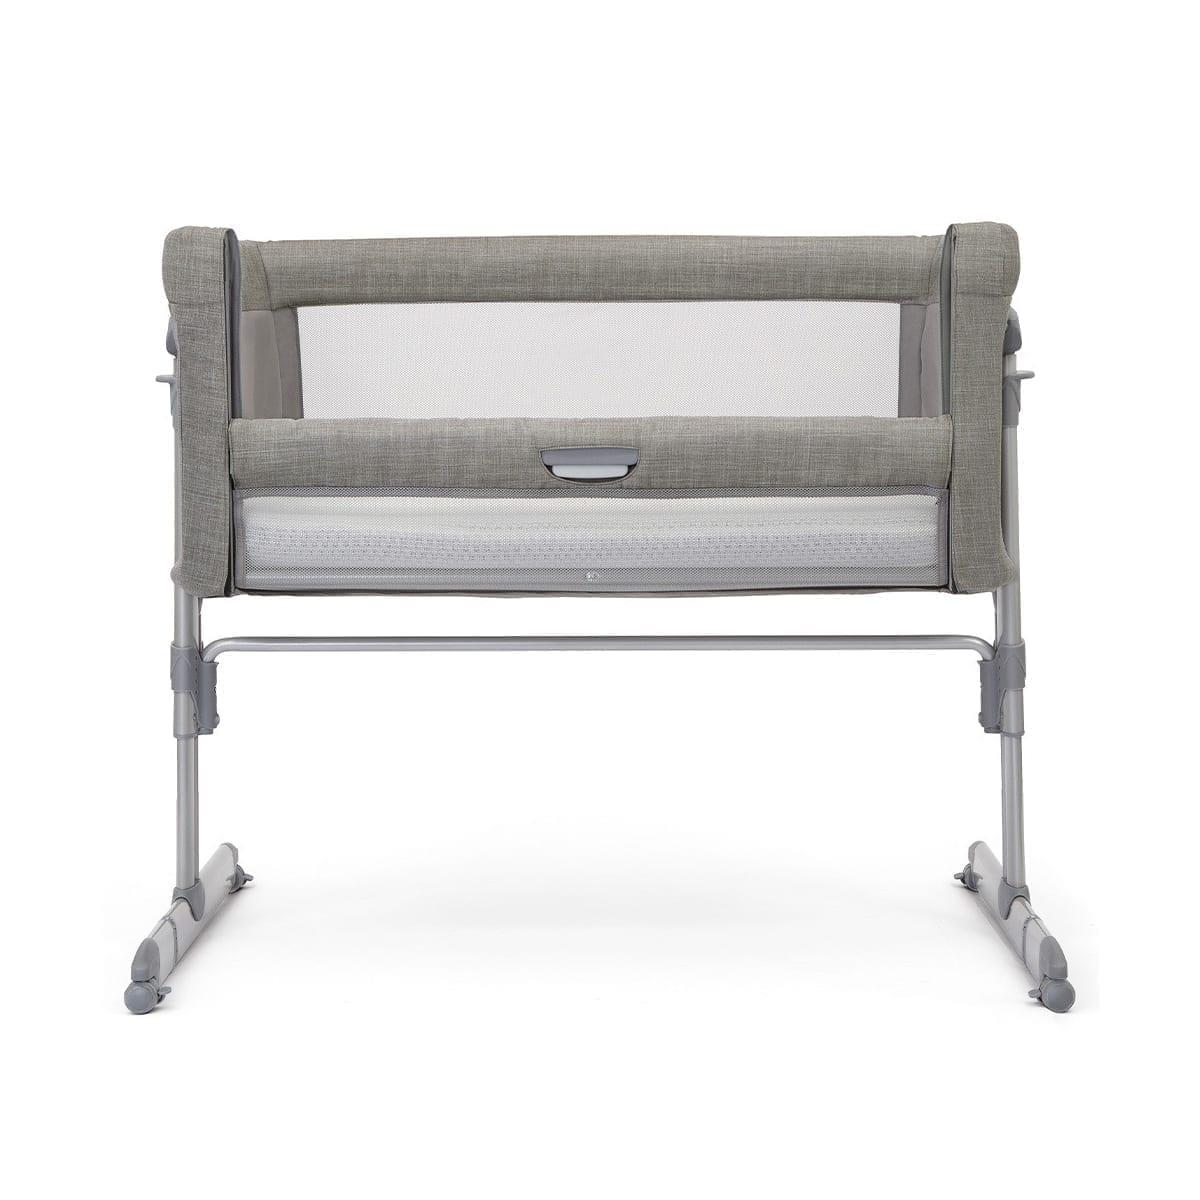 Joie Roomie Glide Bedside Crib - Foggy Grey